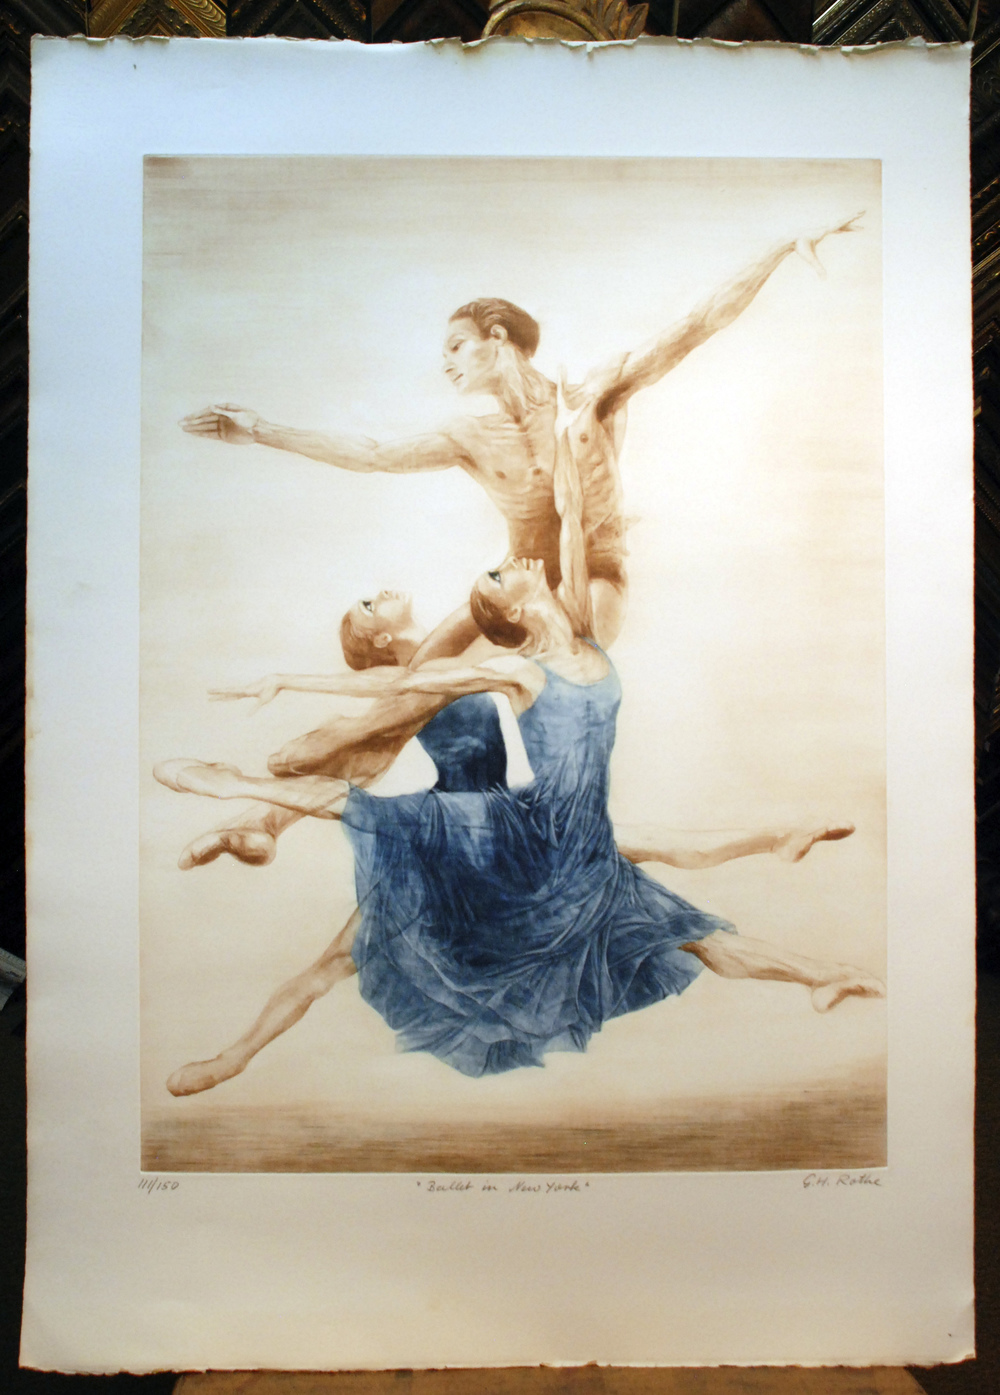 CH-Rothe-BalletinNewYork2.jpg